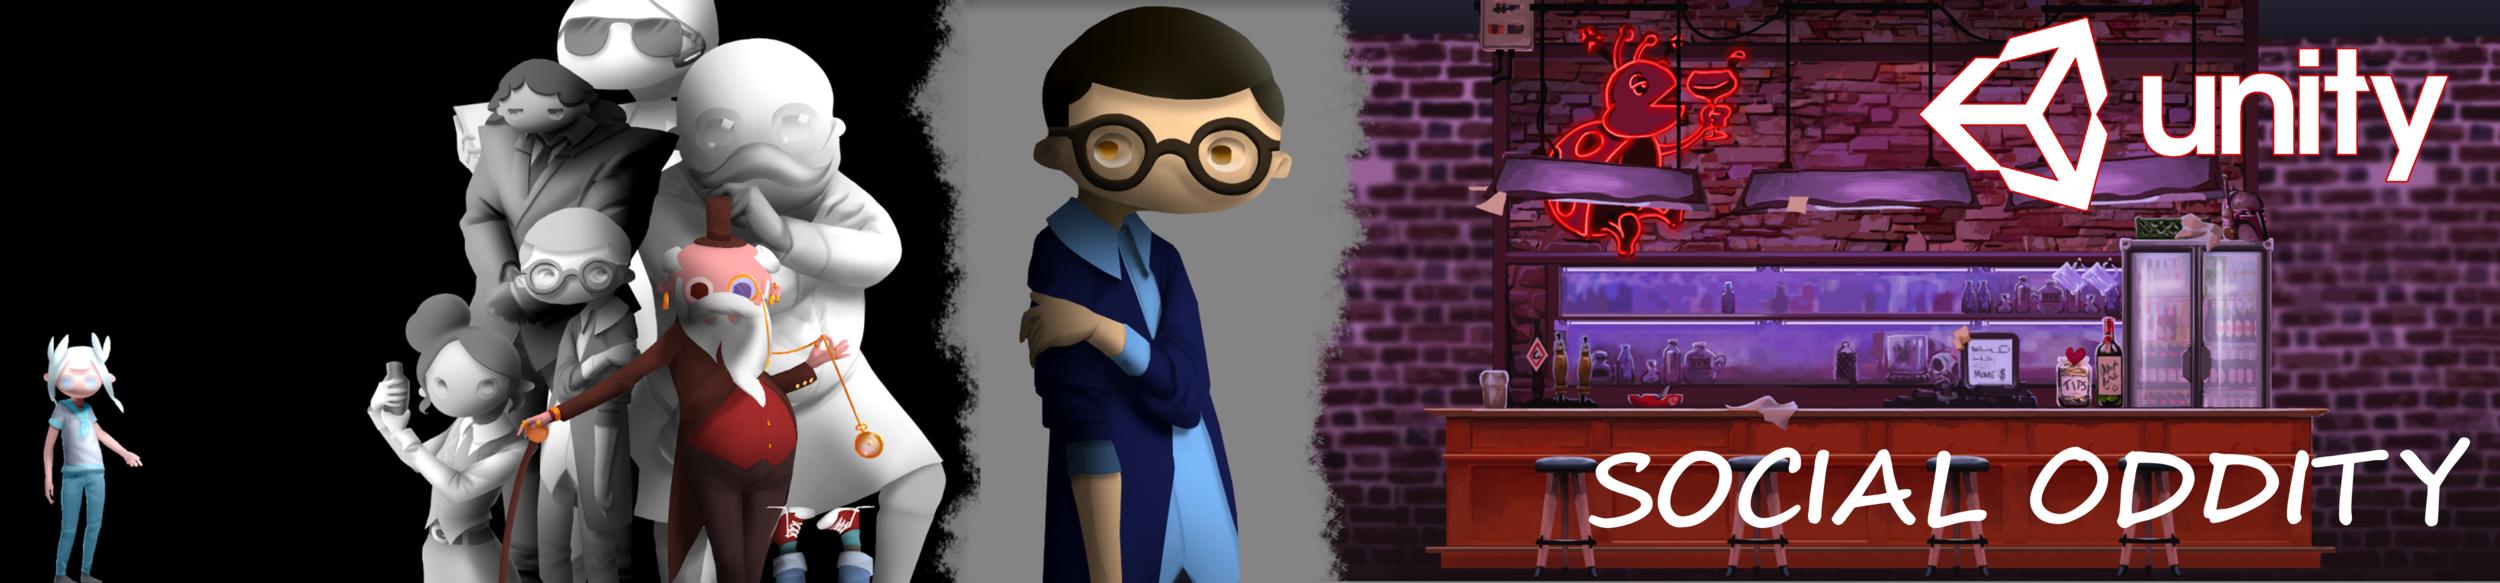 Social Oddity  - Game project @ FutureGames